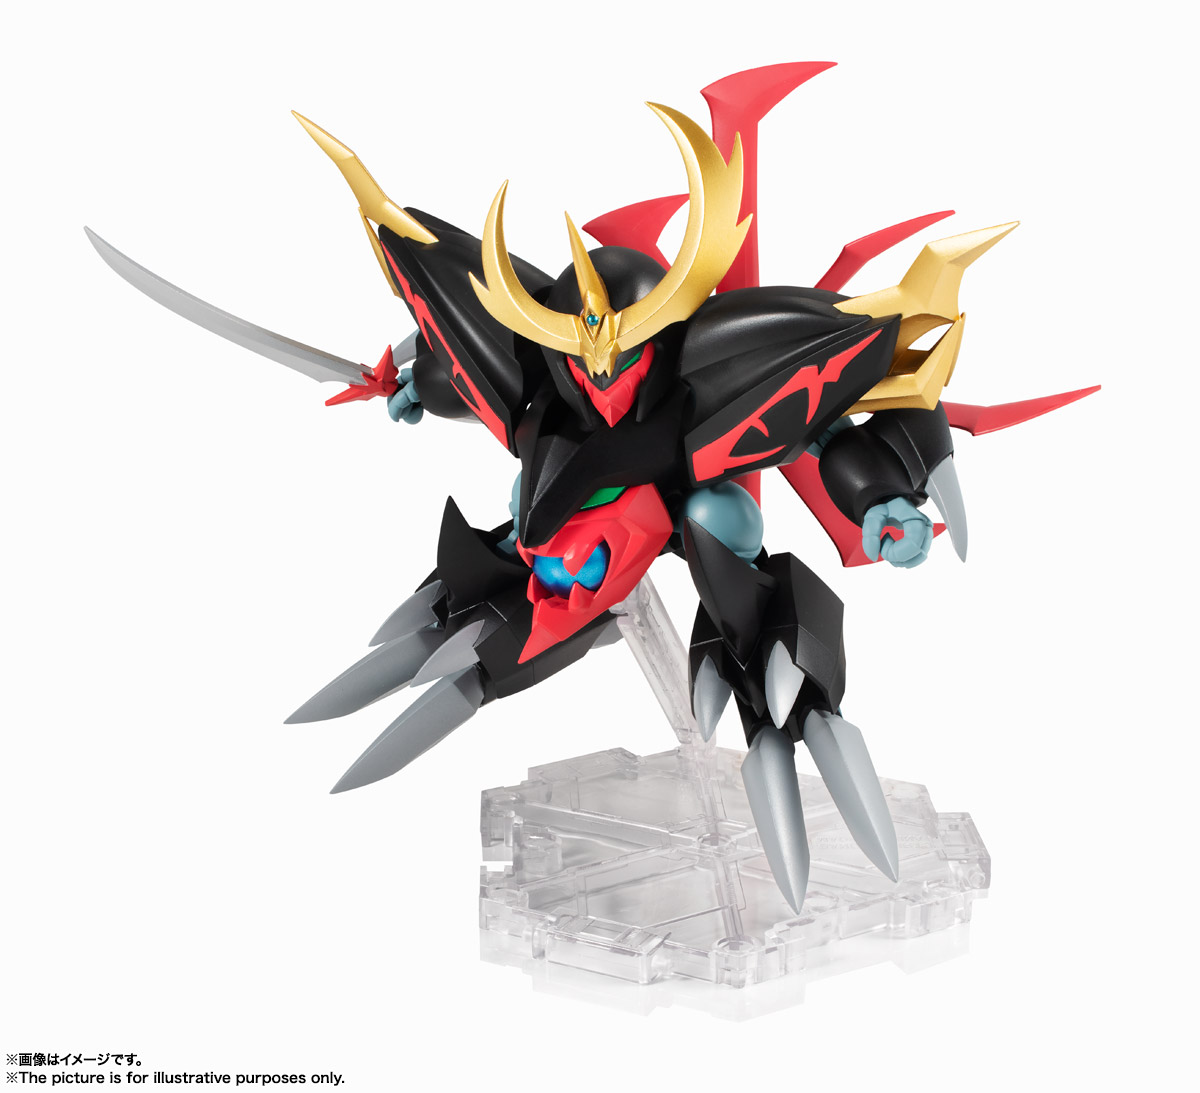 NXEDGE STYLE[MASHIN UNIT]『邪戦角』魔神英雄伝ワタル 可動フィギュア-002